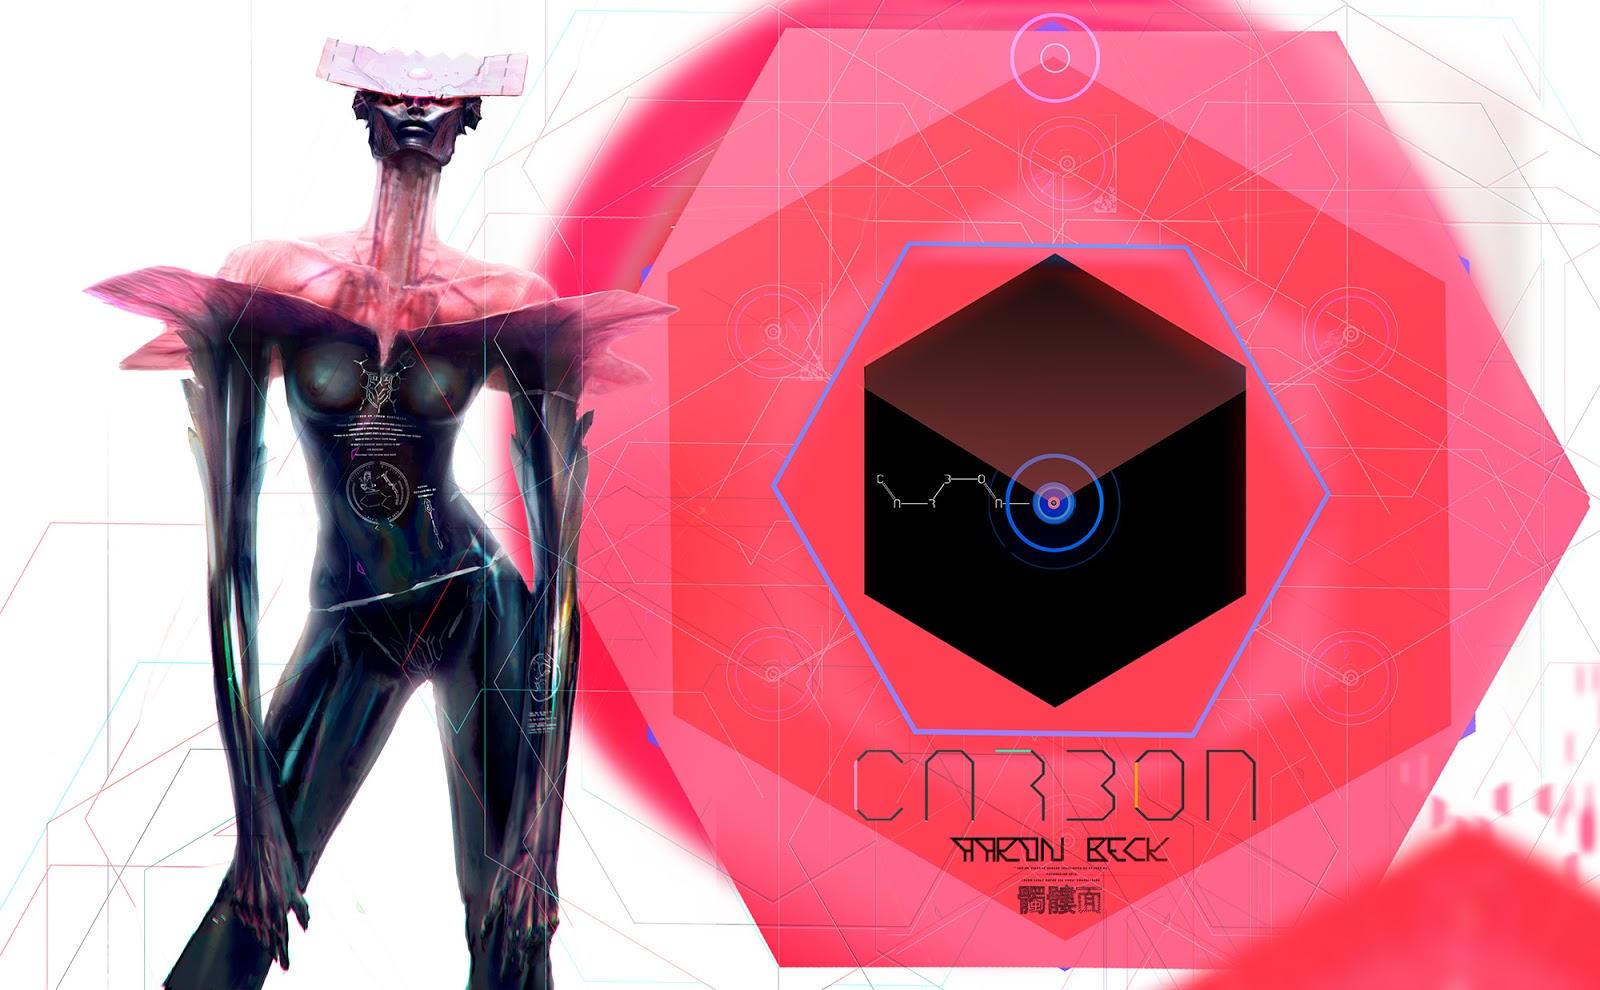 Carbon_pink_01.jpg